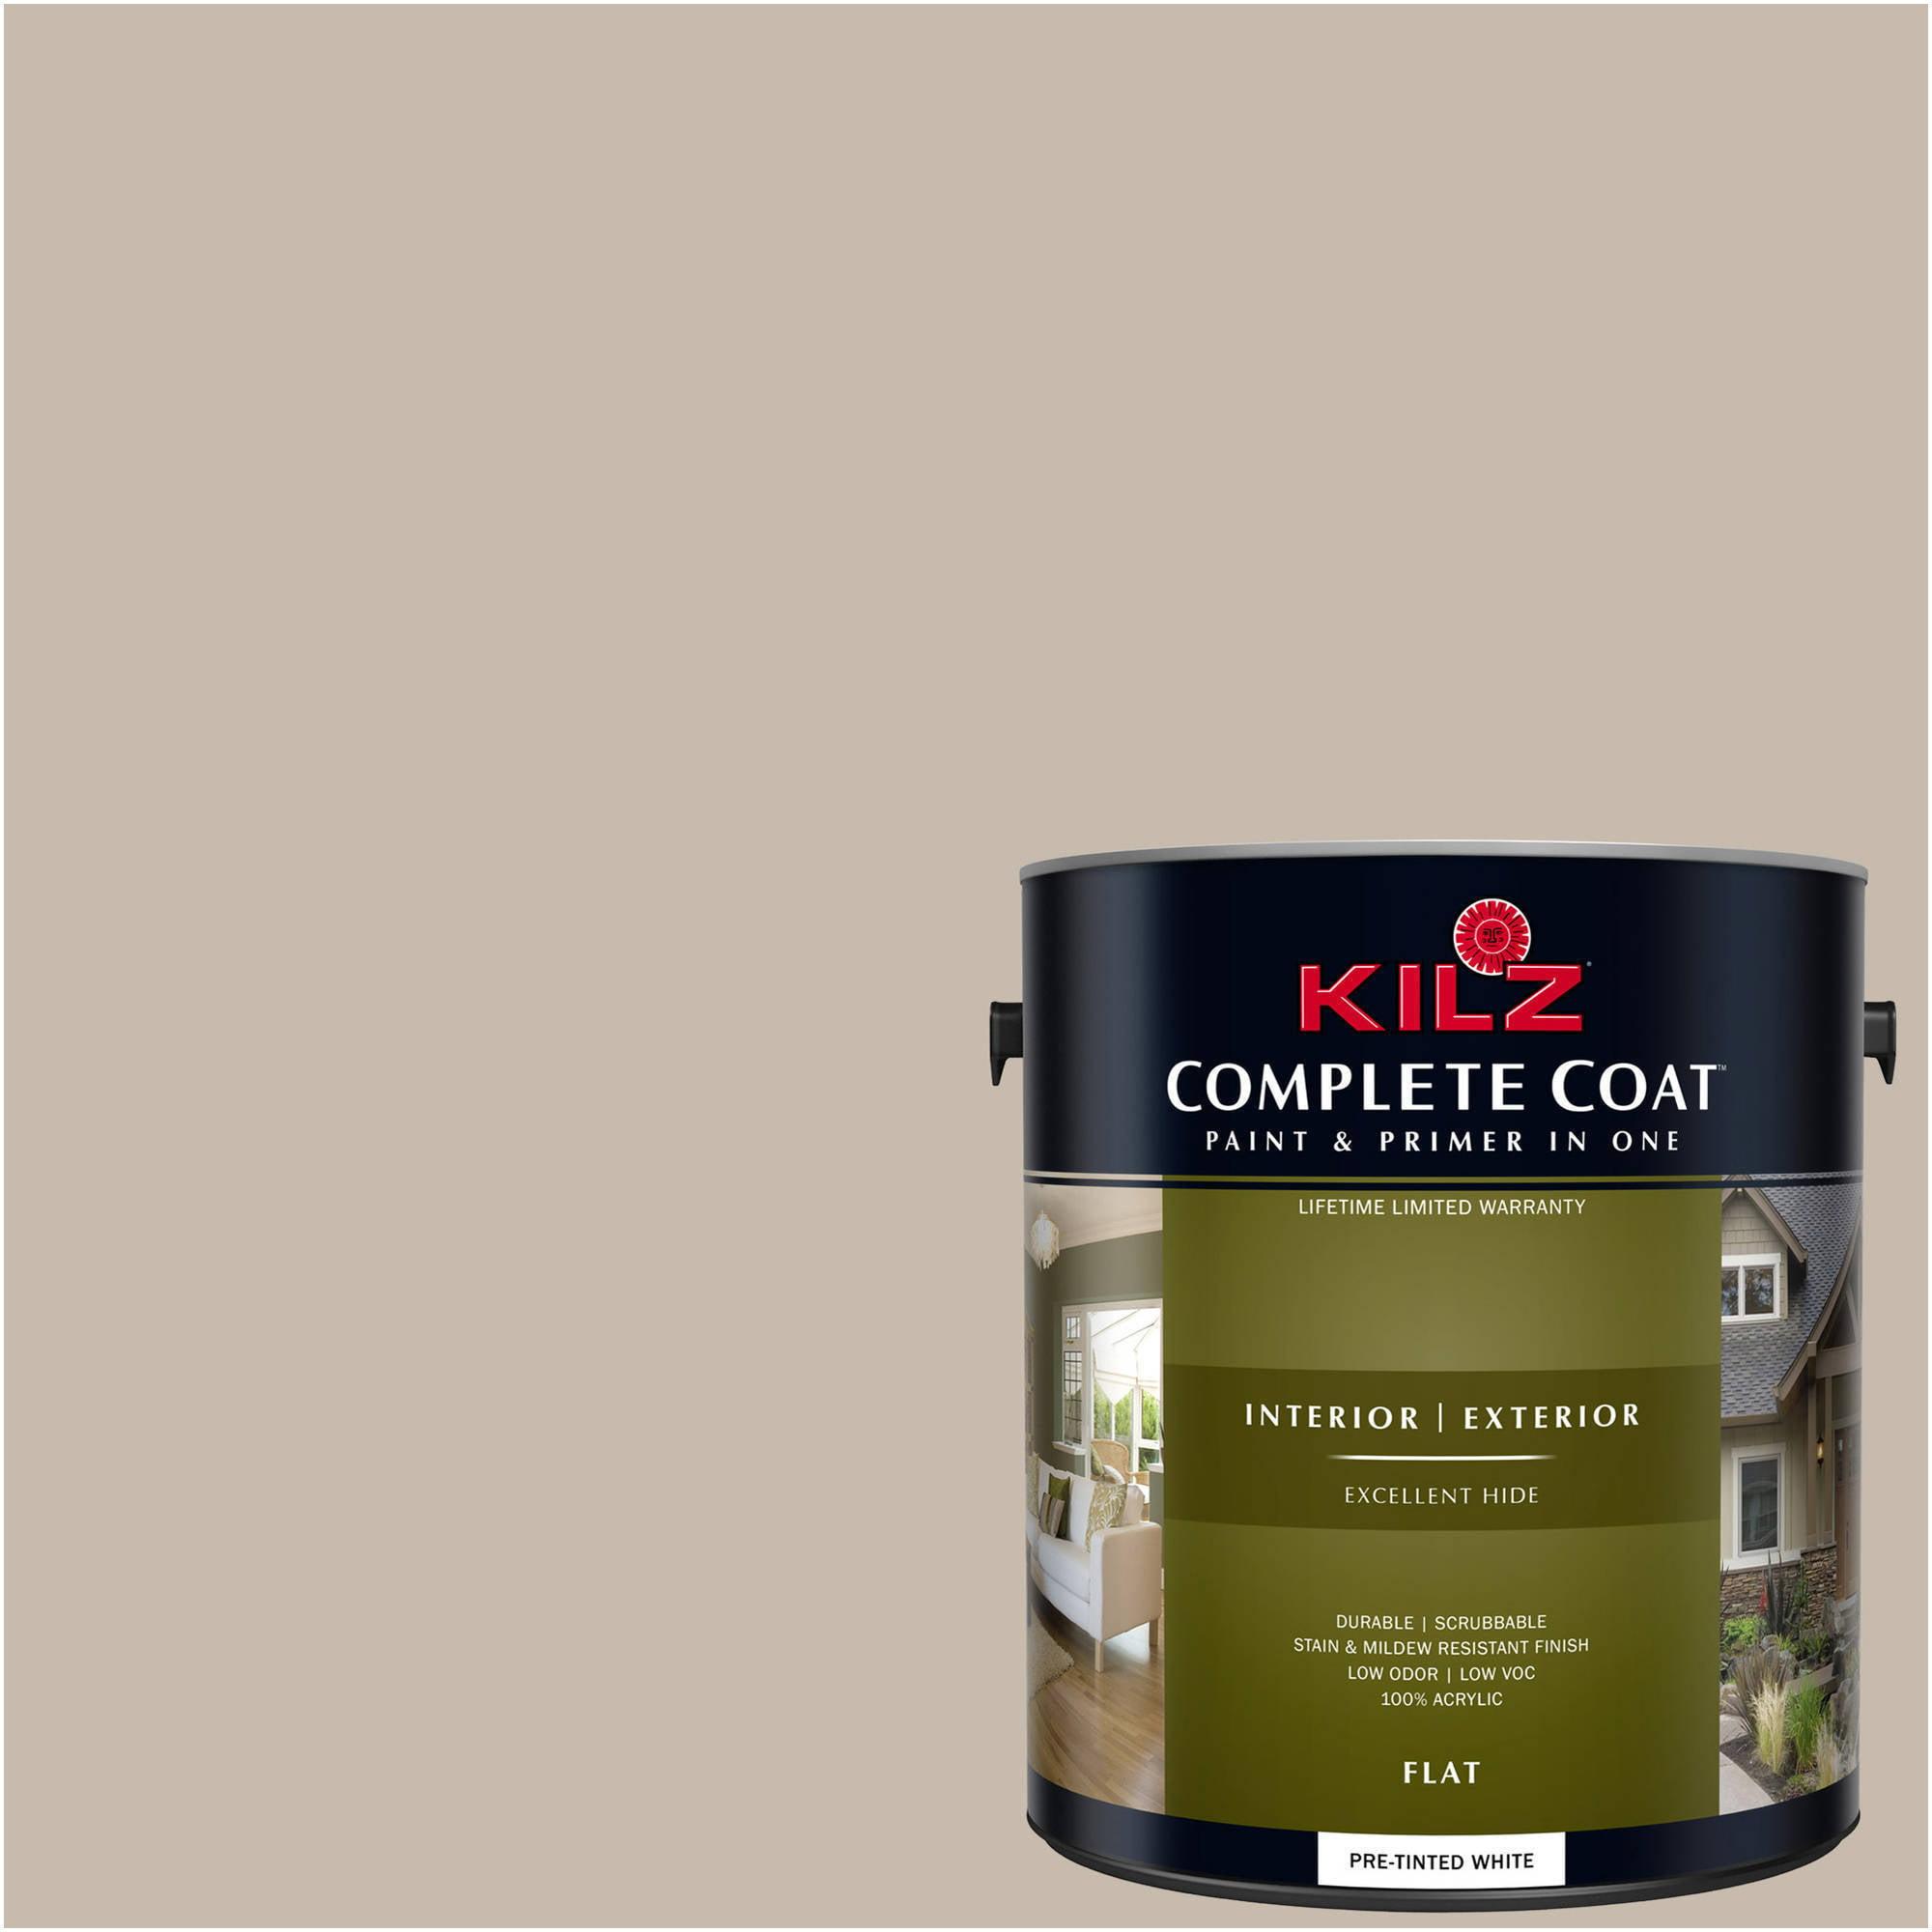 KILZ COMPLETE COAT Interior/Exterior Paint & Primer in One #LK170  Sophistication